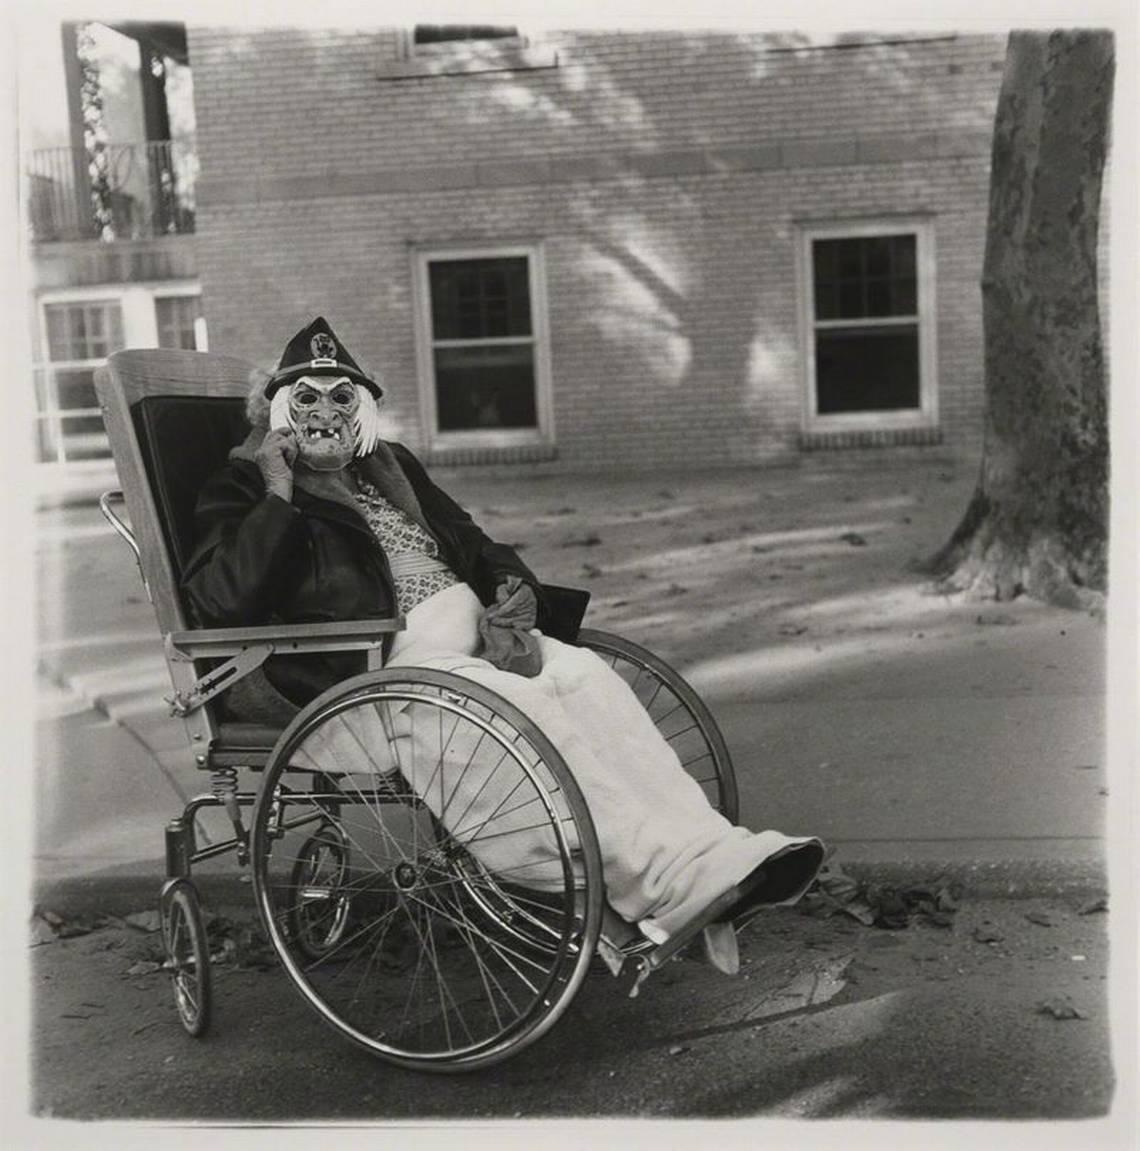 Diane Arbus, Masked woman in a wheelchair, PA. 1970